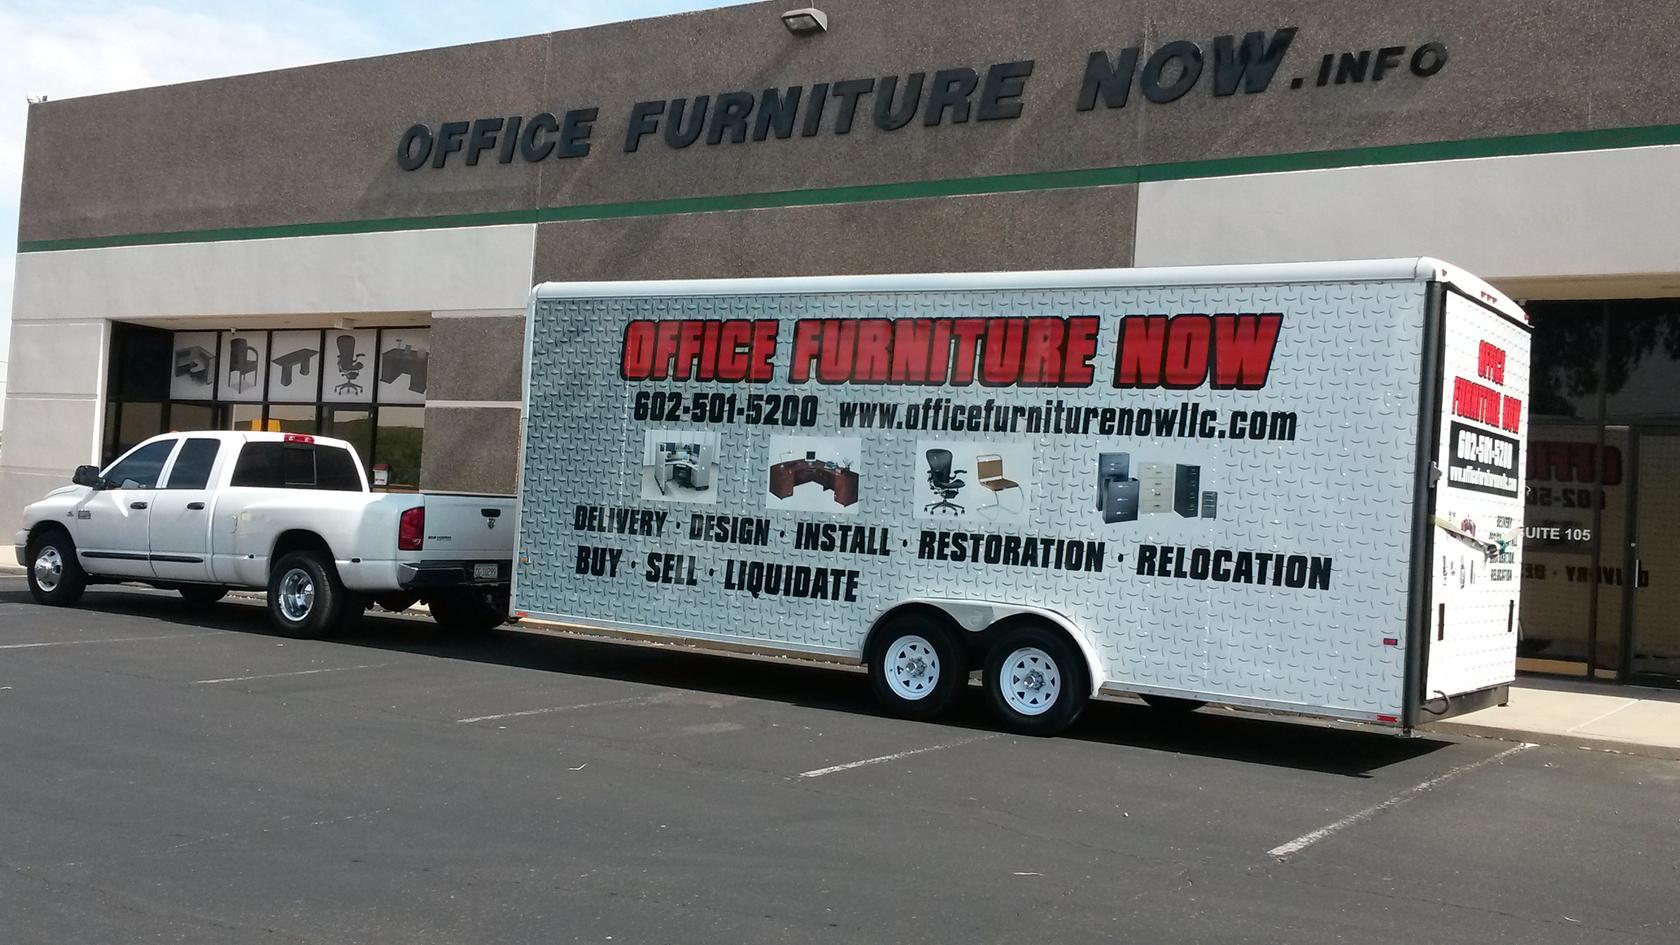 Office Furniture Now 3740 W Van Buren St Ste 104 In Phoenix Az 85009 About Me